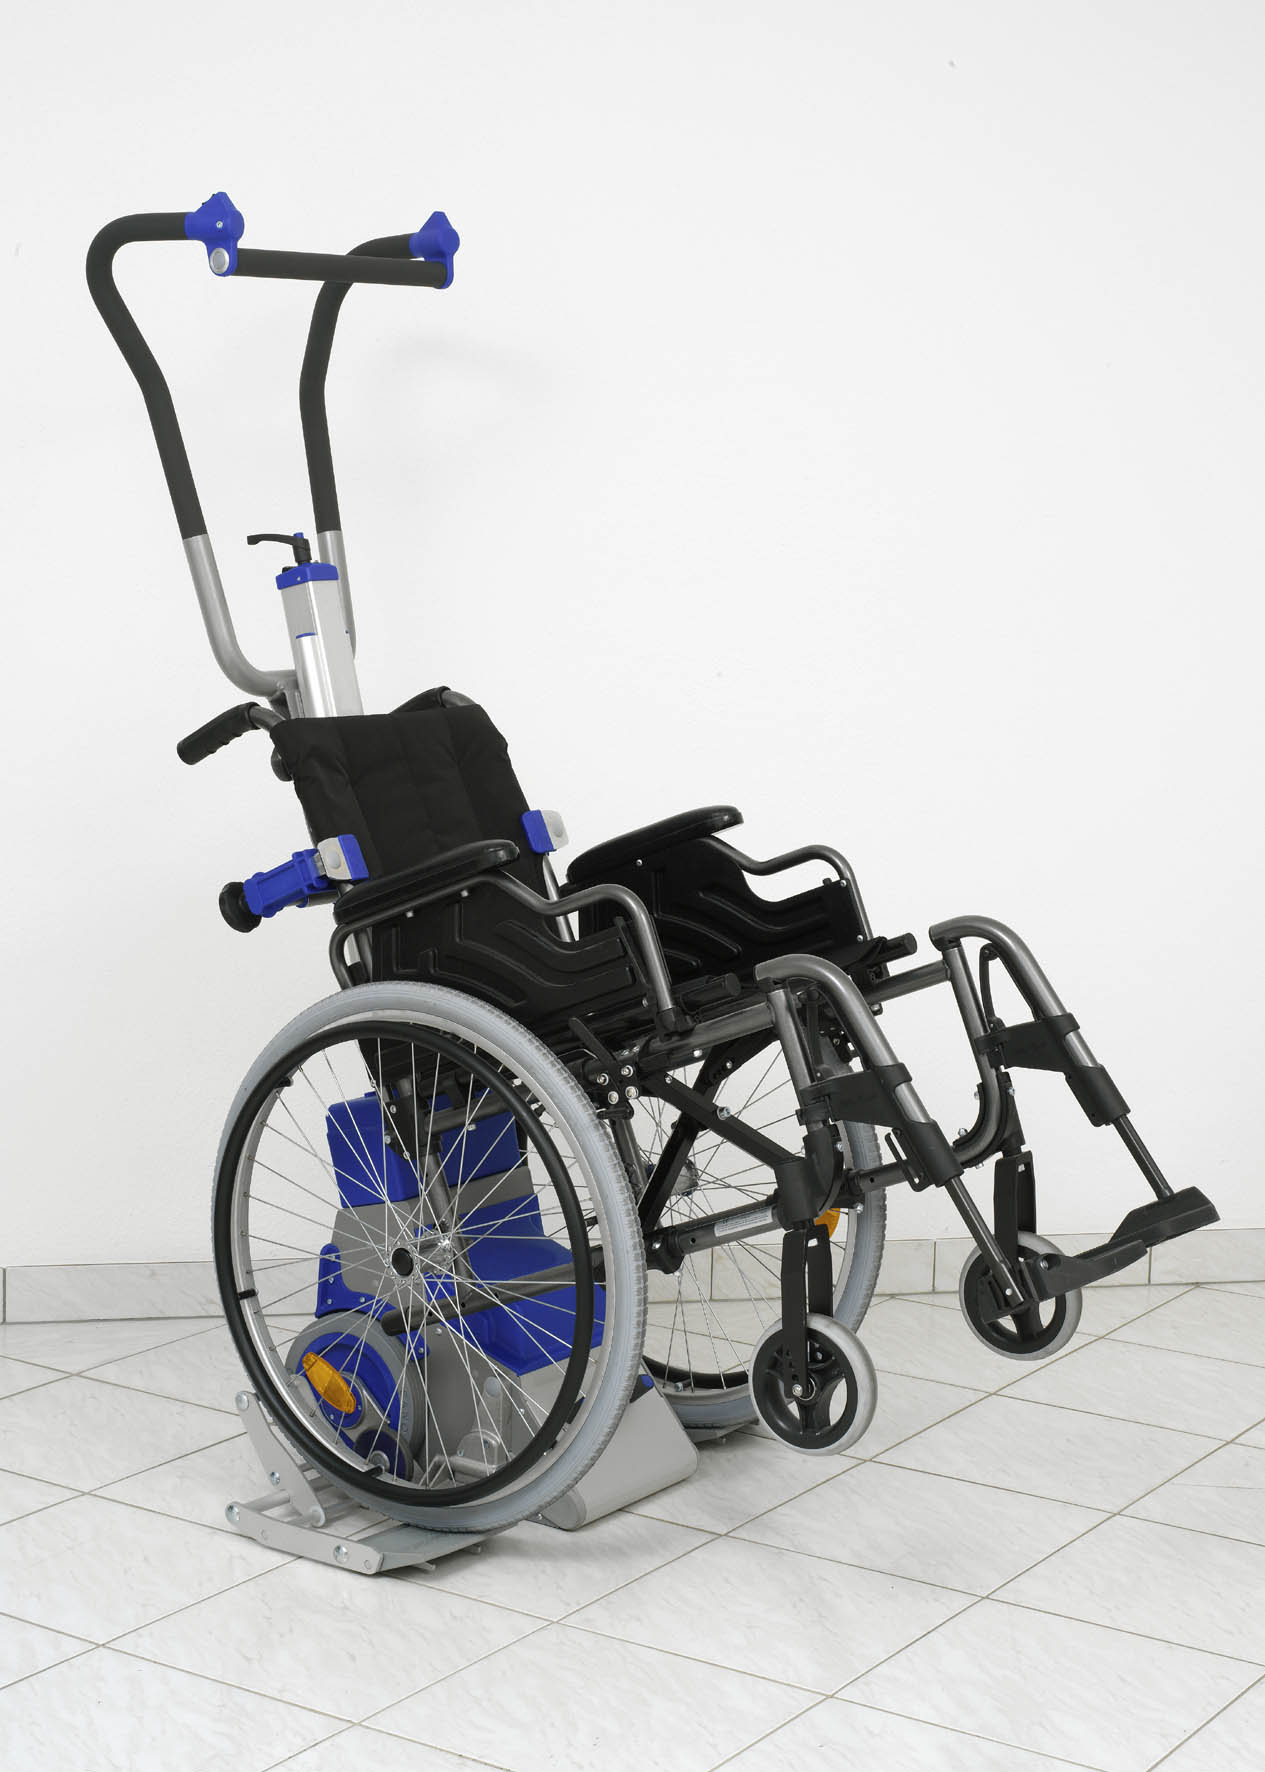 Ejemplo de sube-escaleras Liftkar PT-Uni con silla de ruedas incorporada.